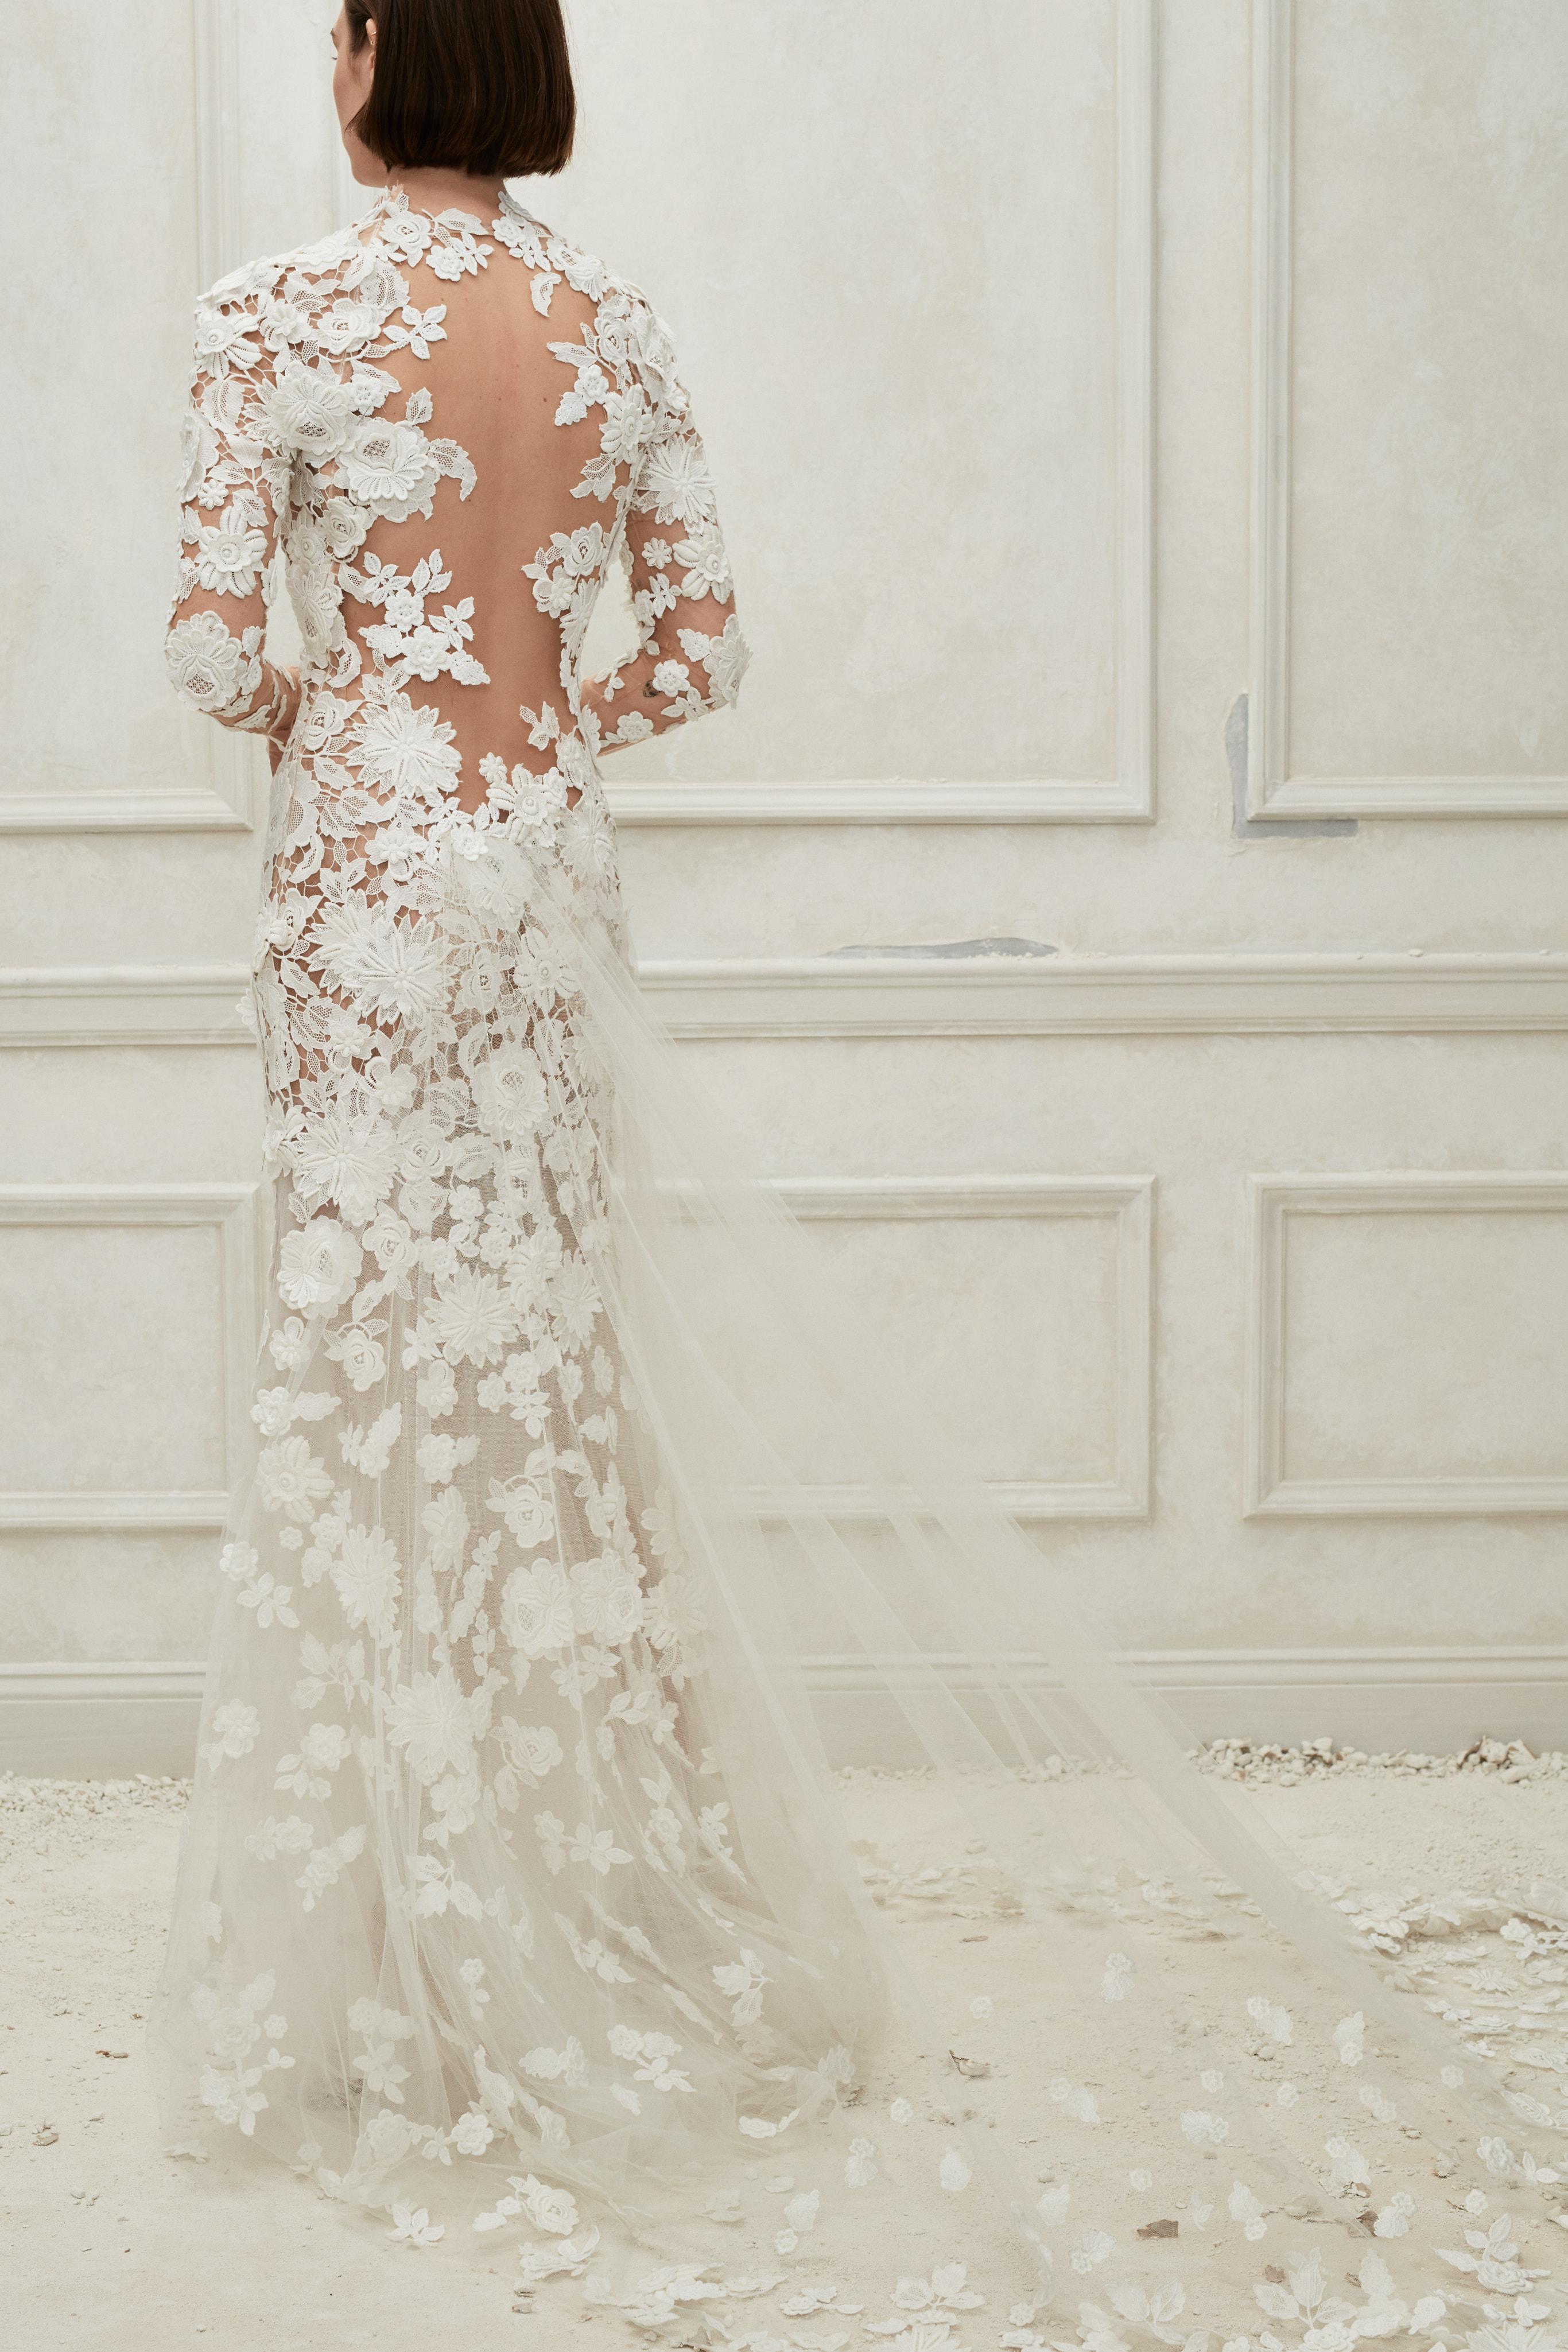 Oscar de la Renta floral long sleeves with train wedding dress fall 2019